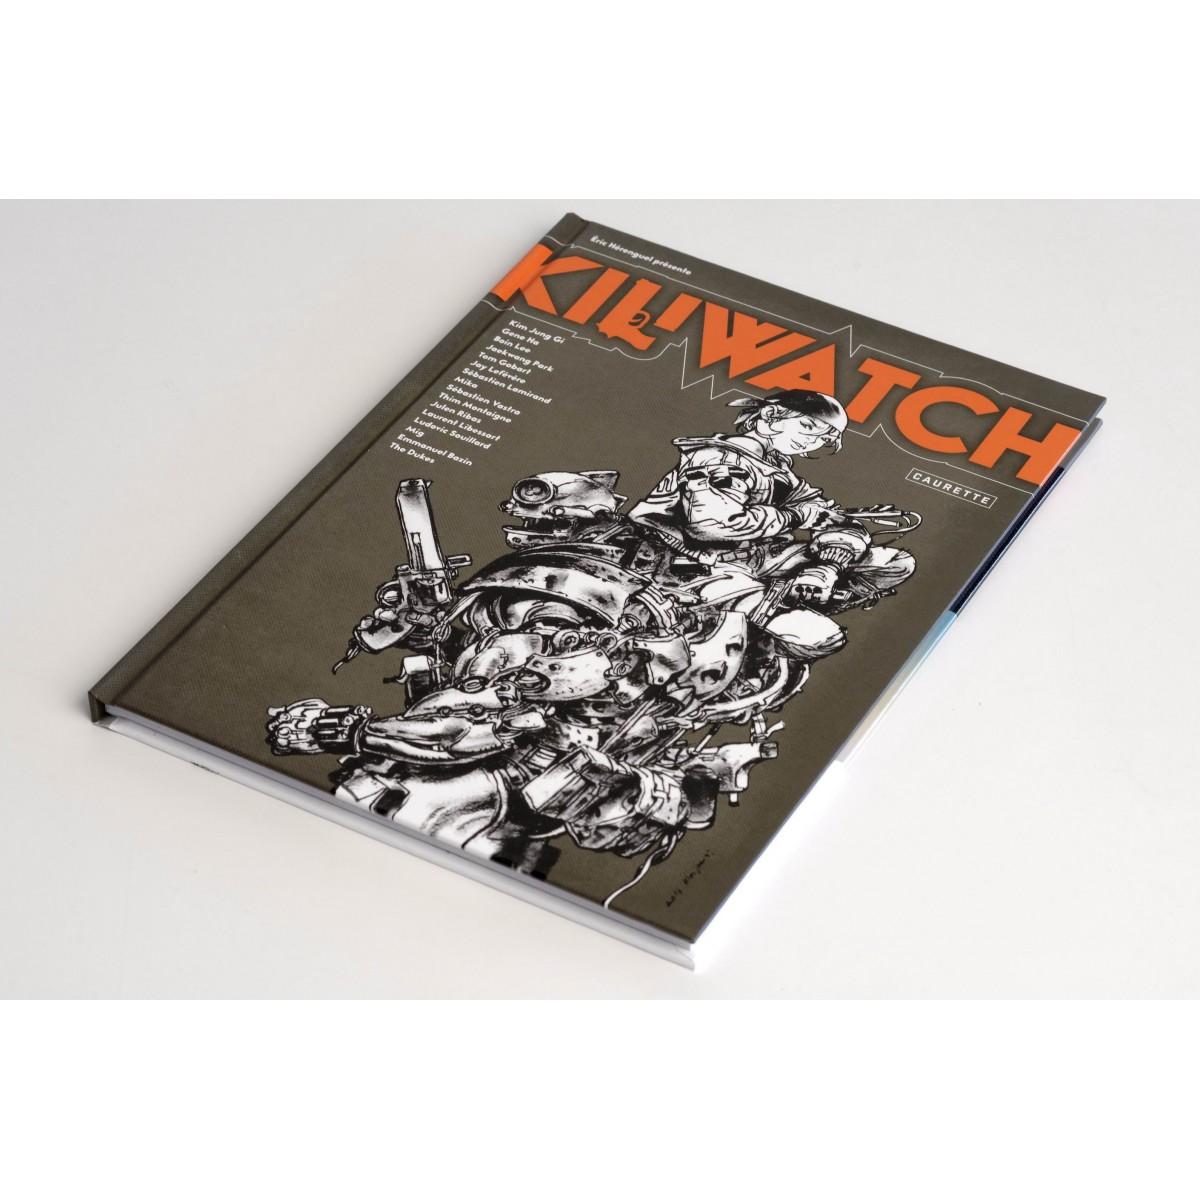 KILIWATCH - Eric Herenguel and C °